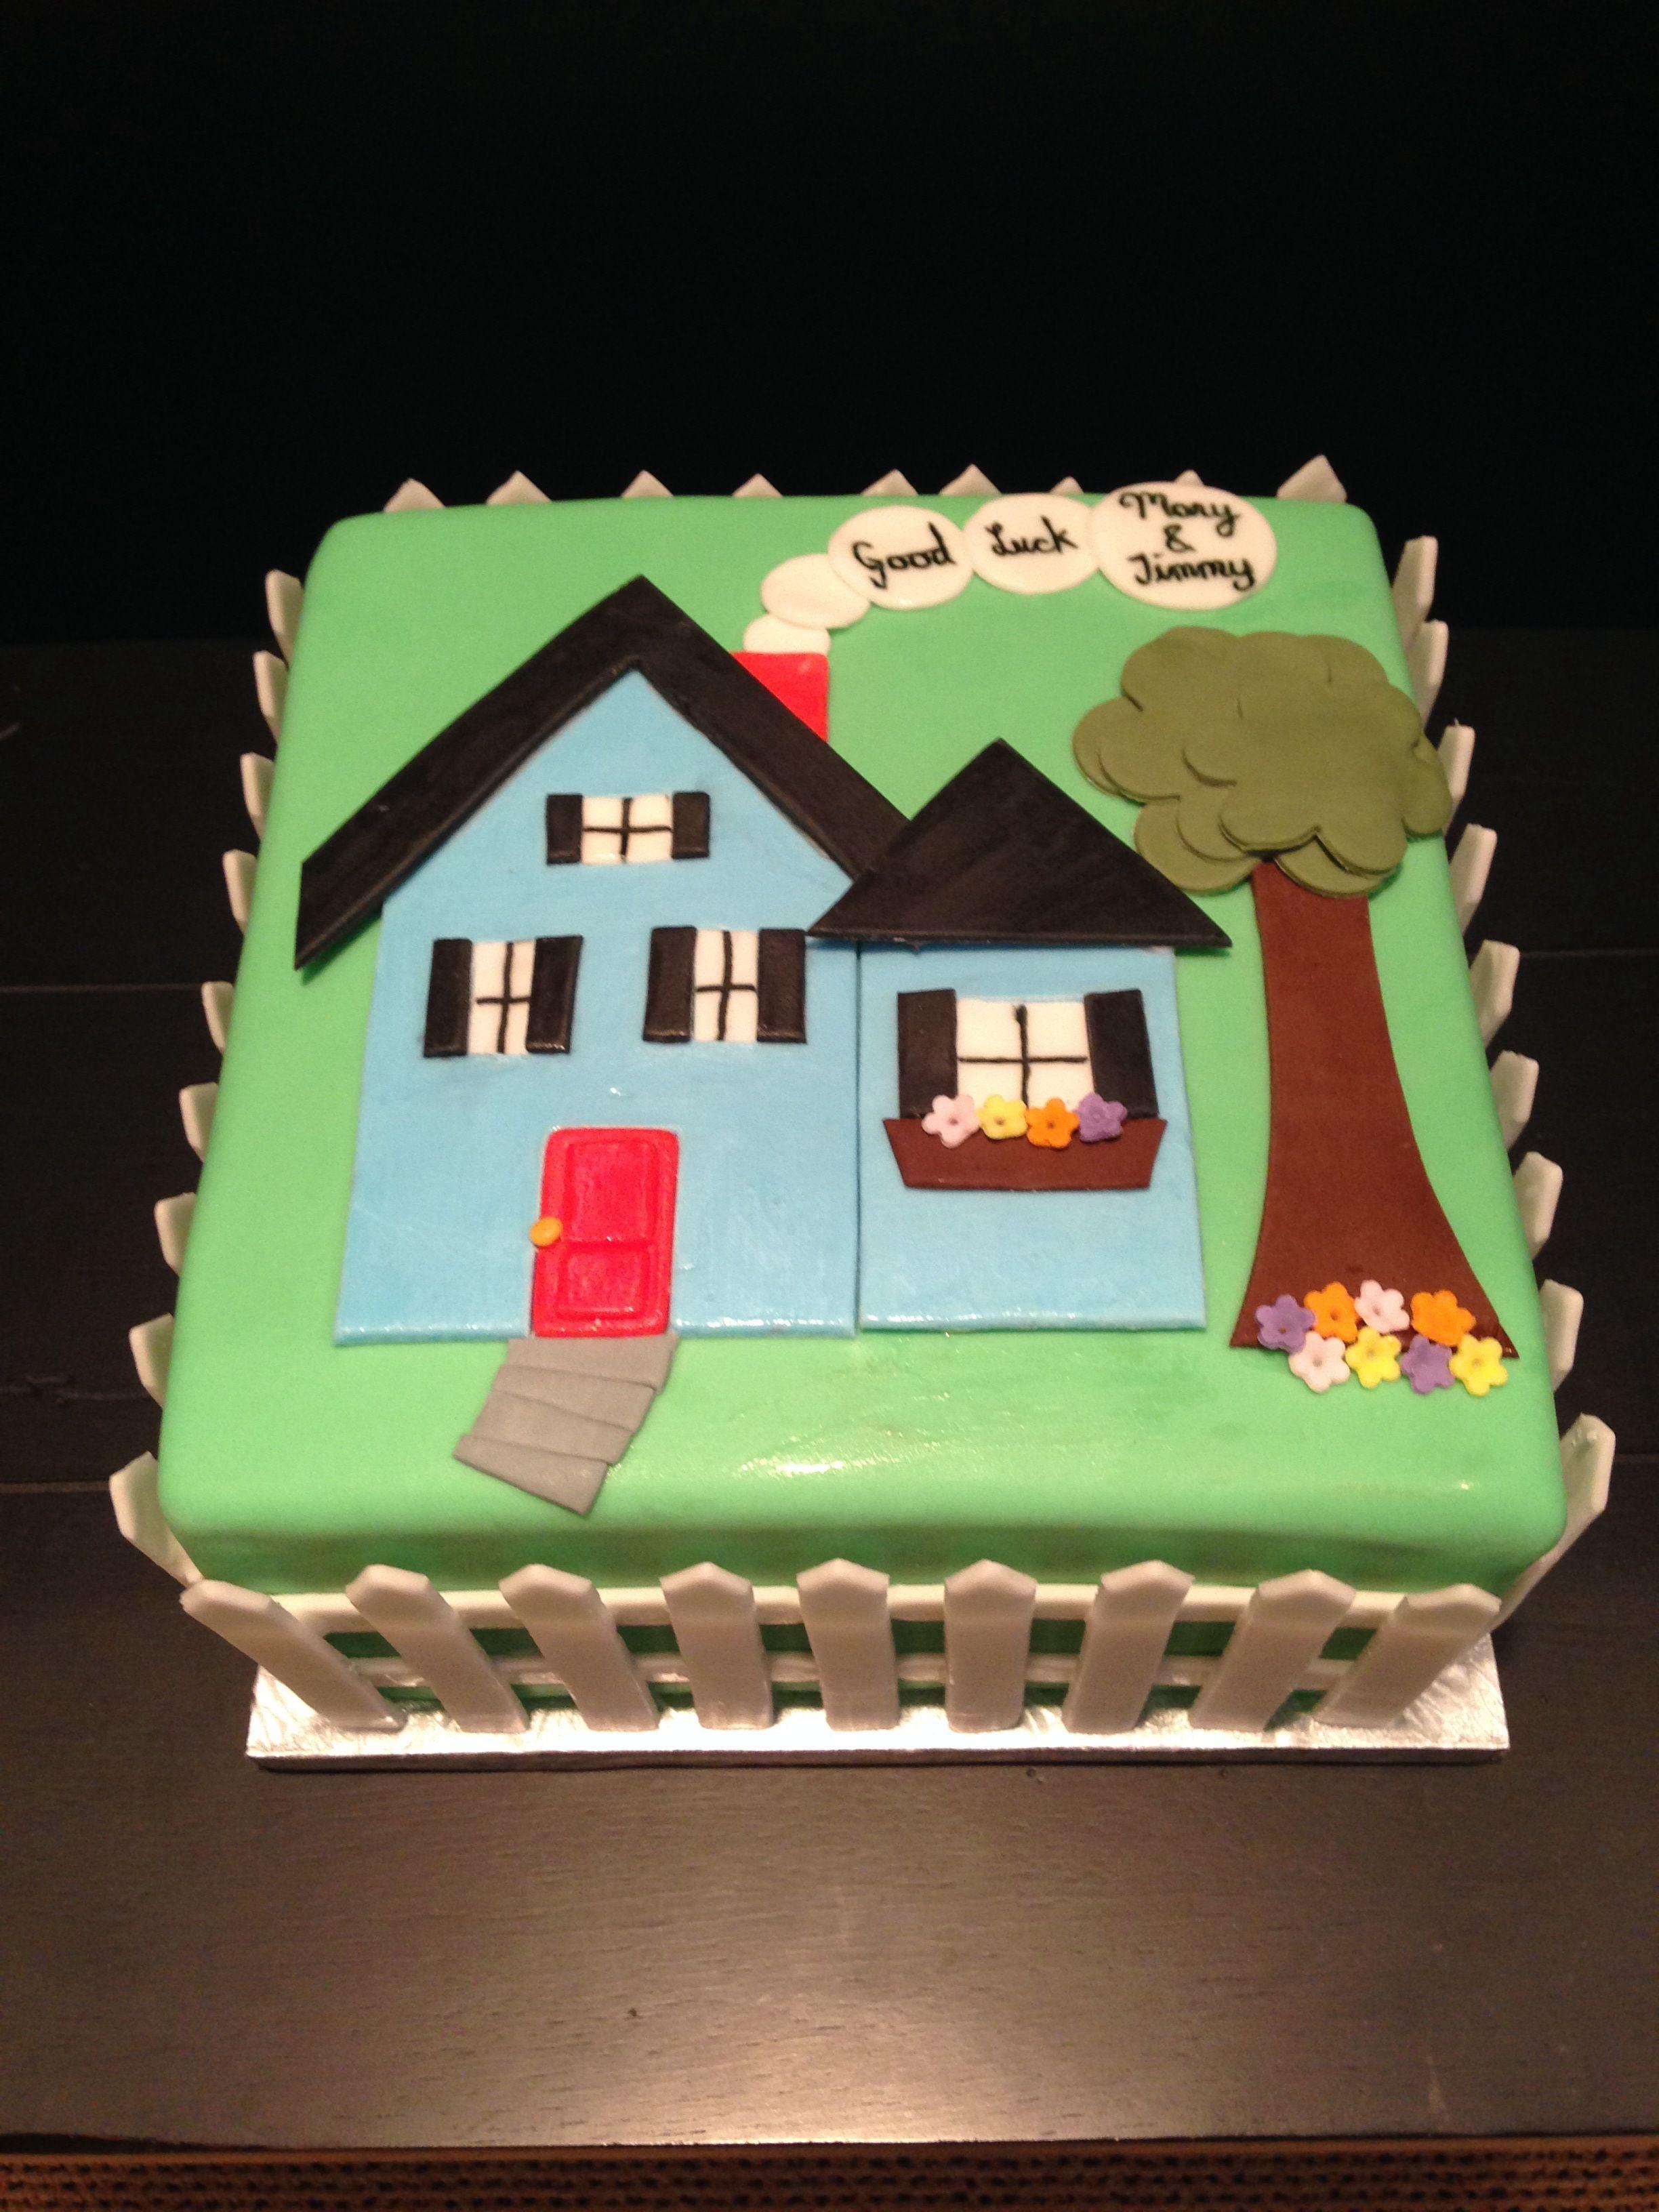 New Home Cake Themed Cakes Pinterest Cake Cake Decorating